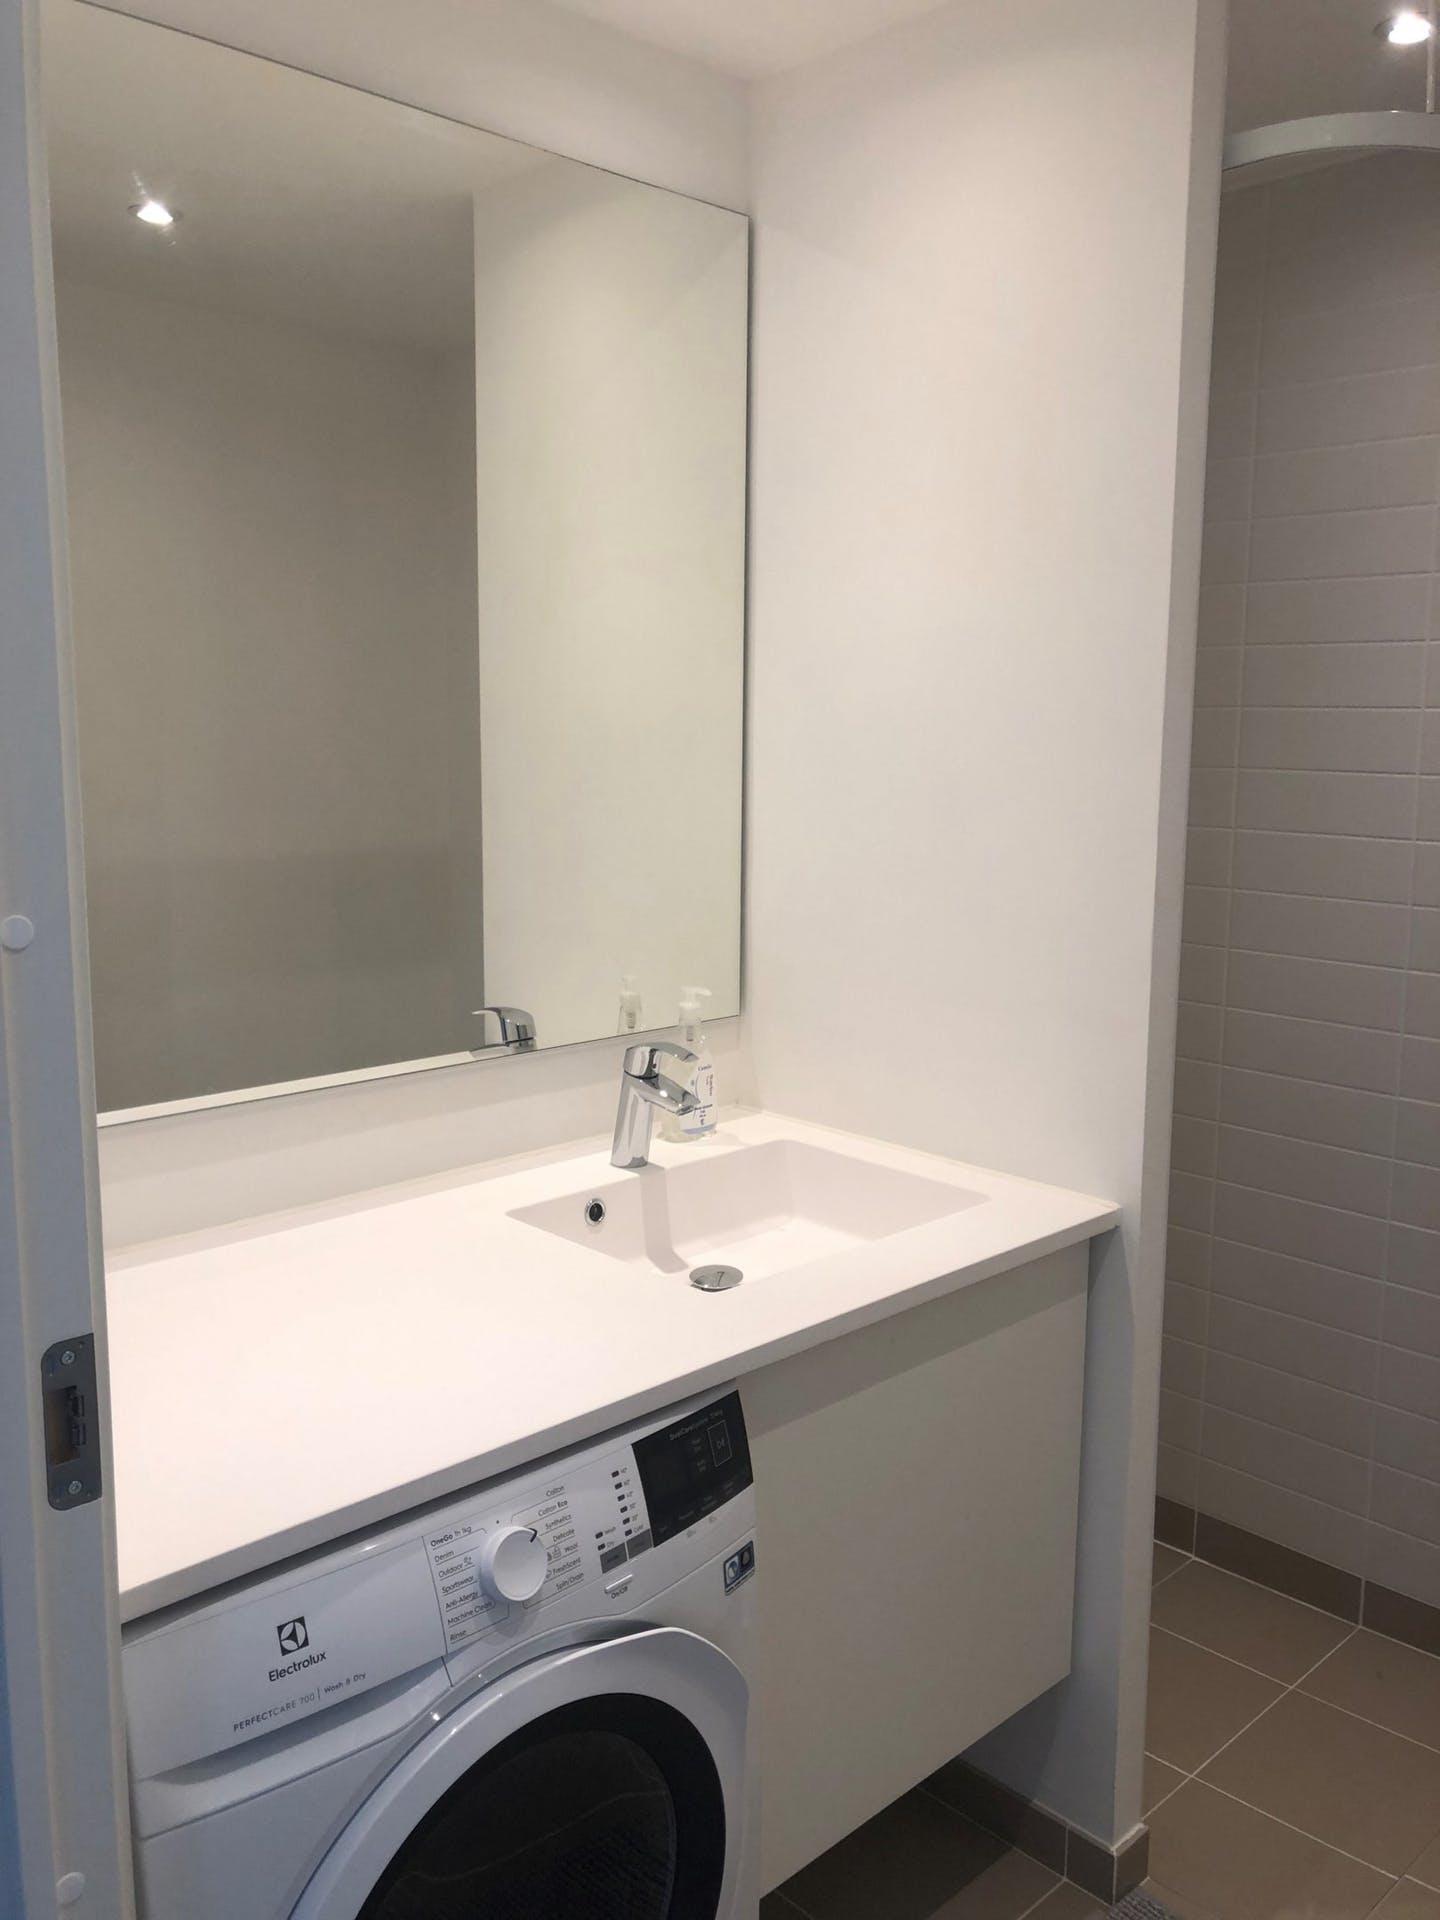 Sink at Møllehatten 11 Apartment, Risskov, Aarhus